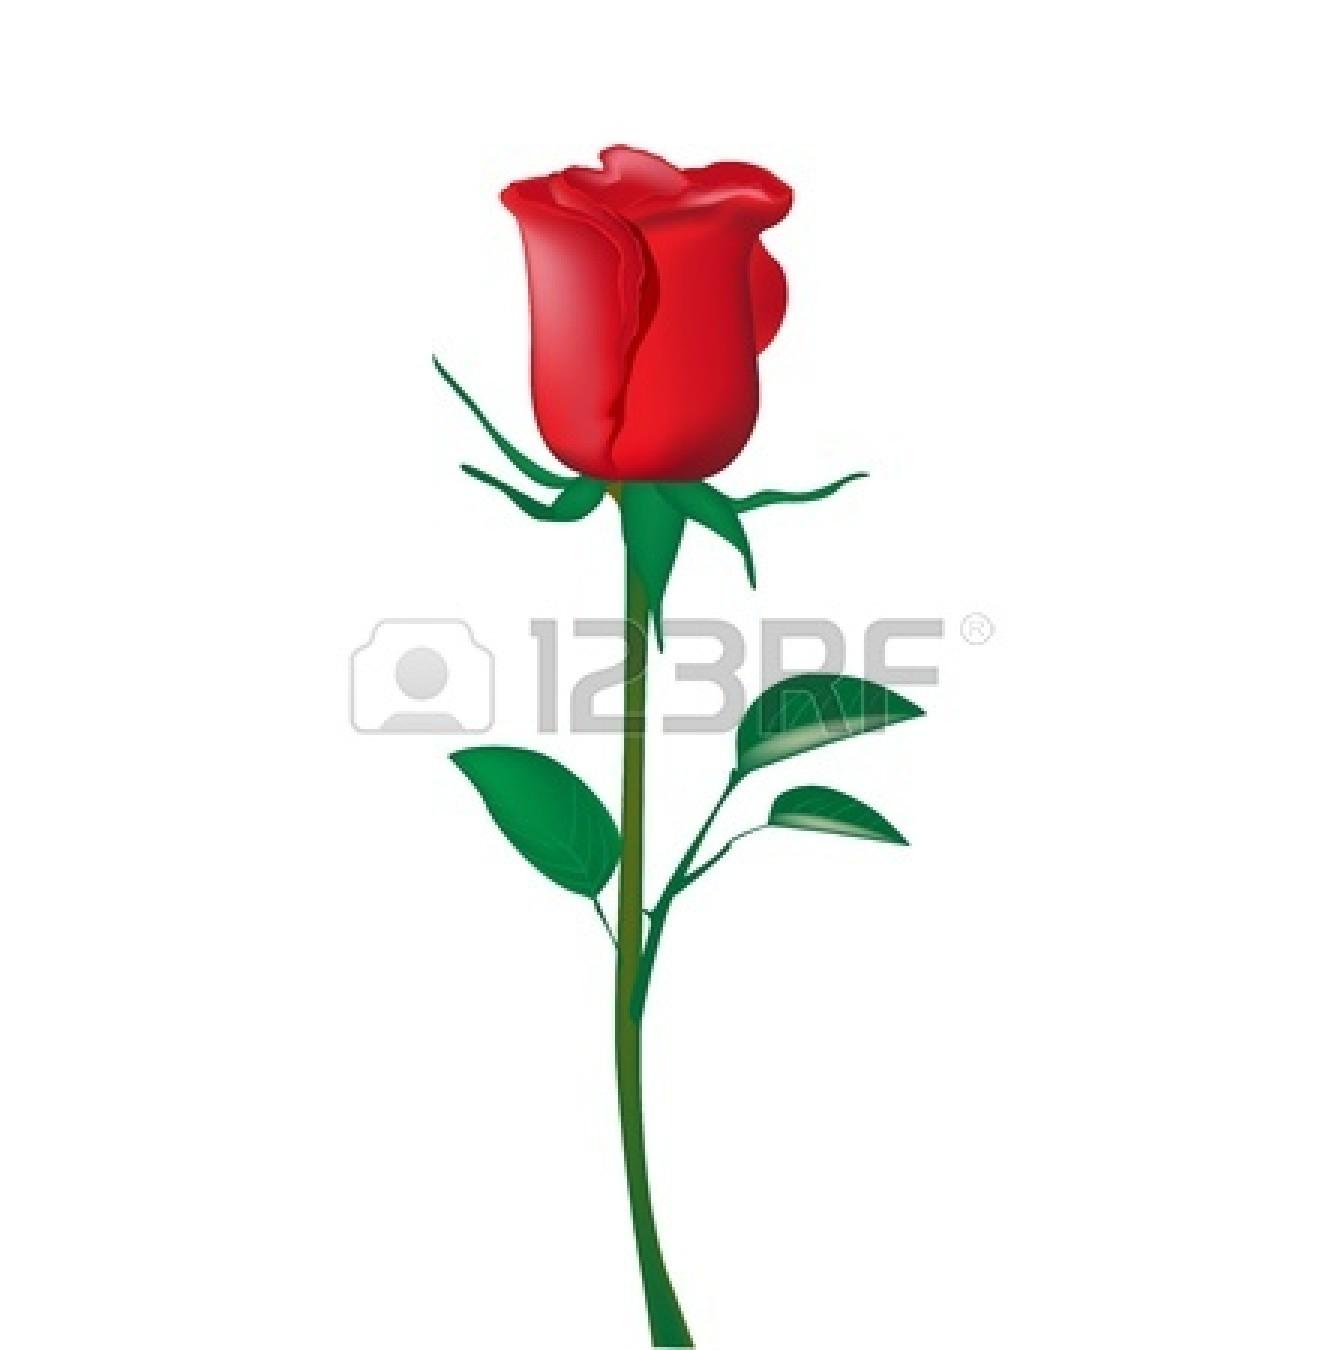 Single Stem Rose Clip Art.